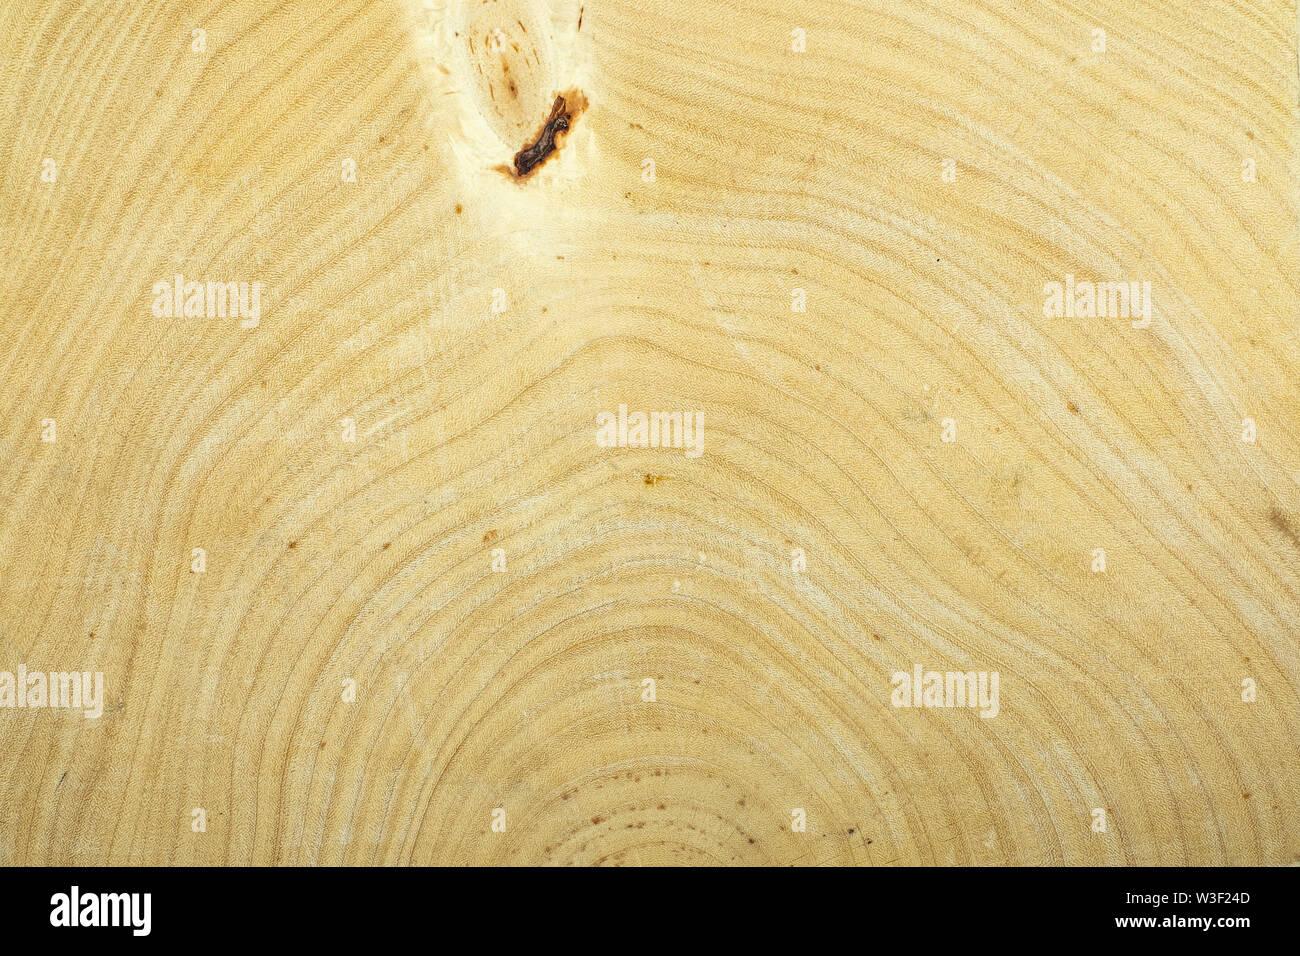 Anneau annuel bois texture de fond de tamarin Photo Stock